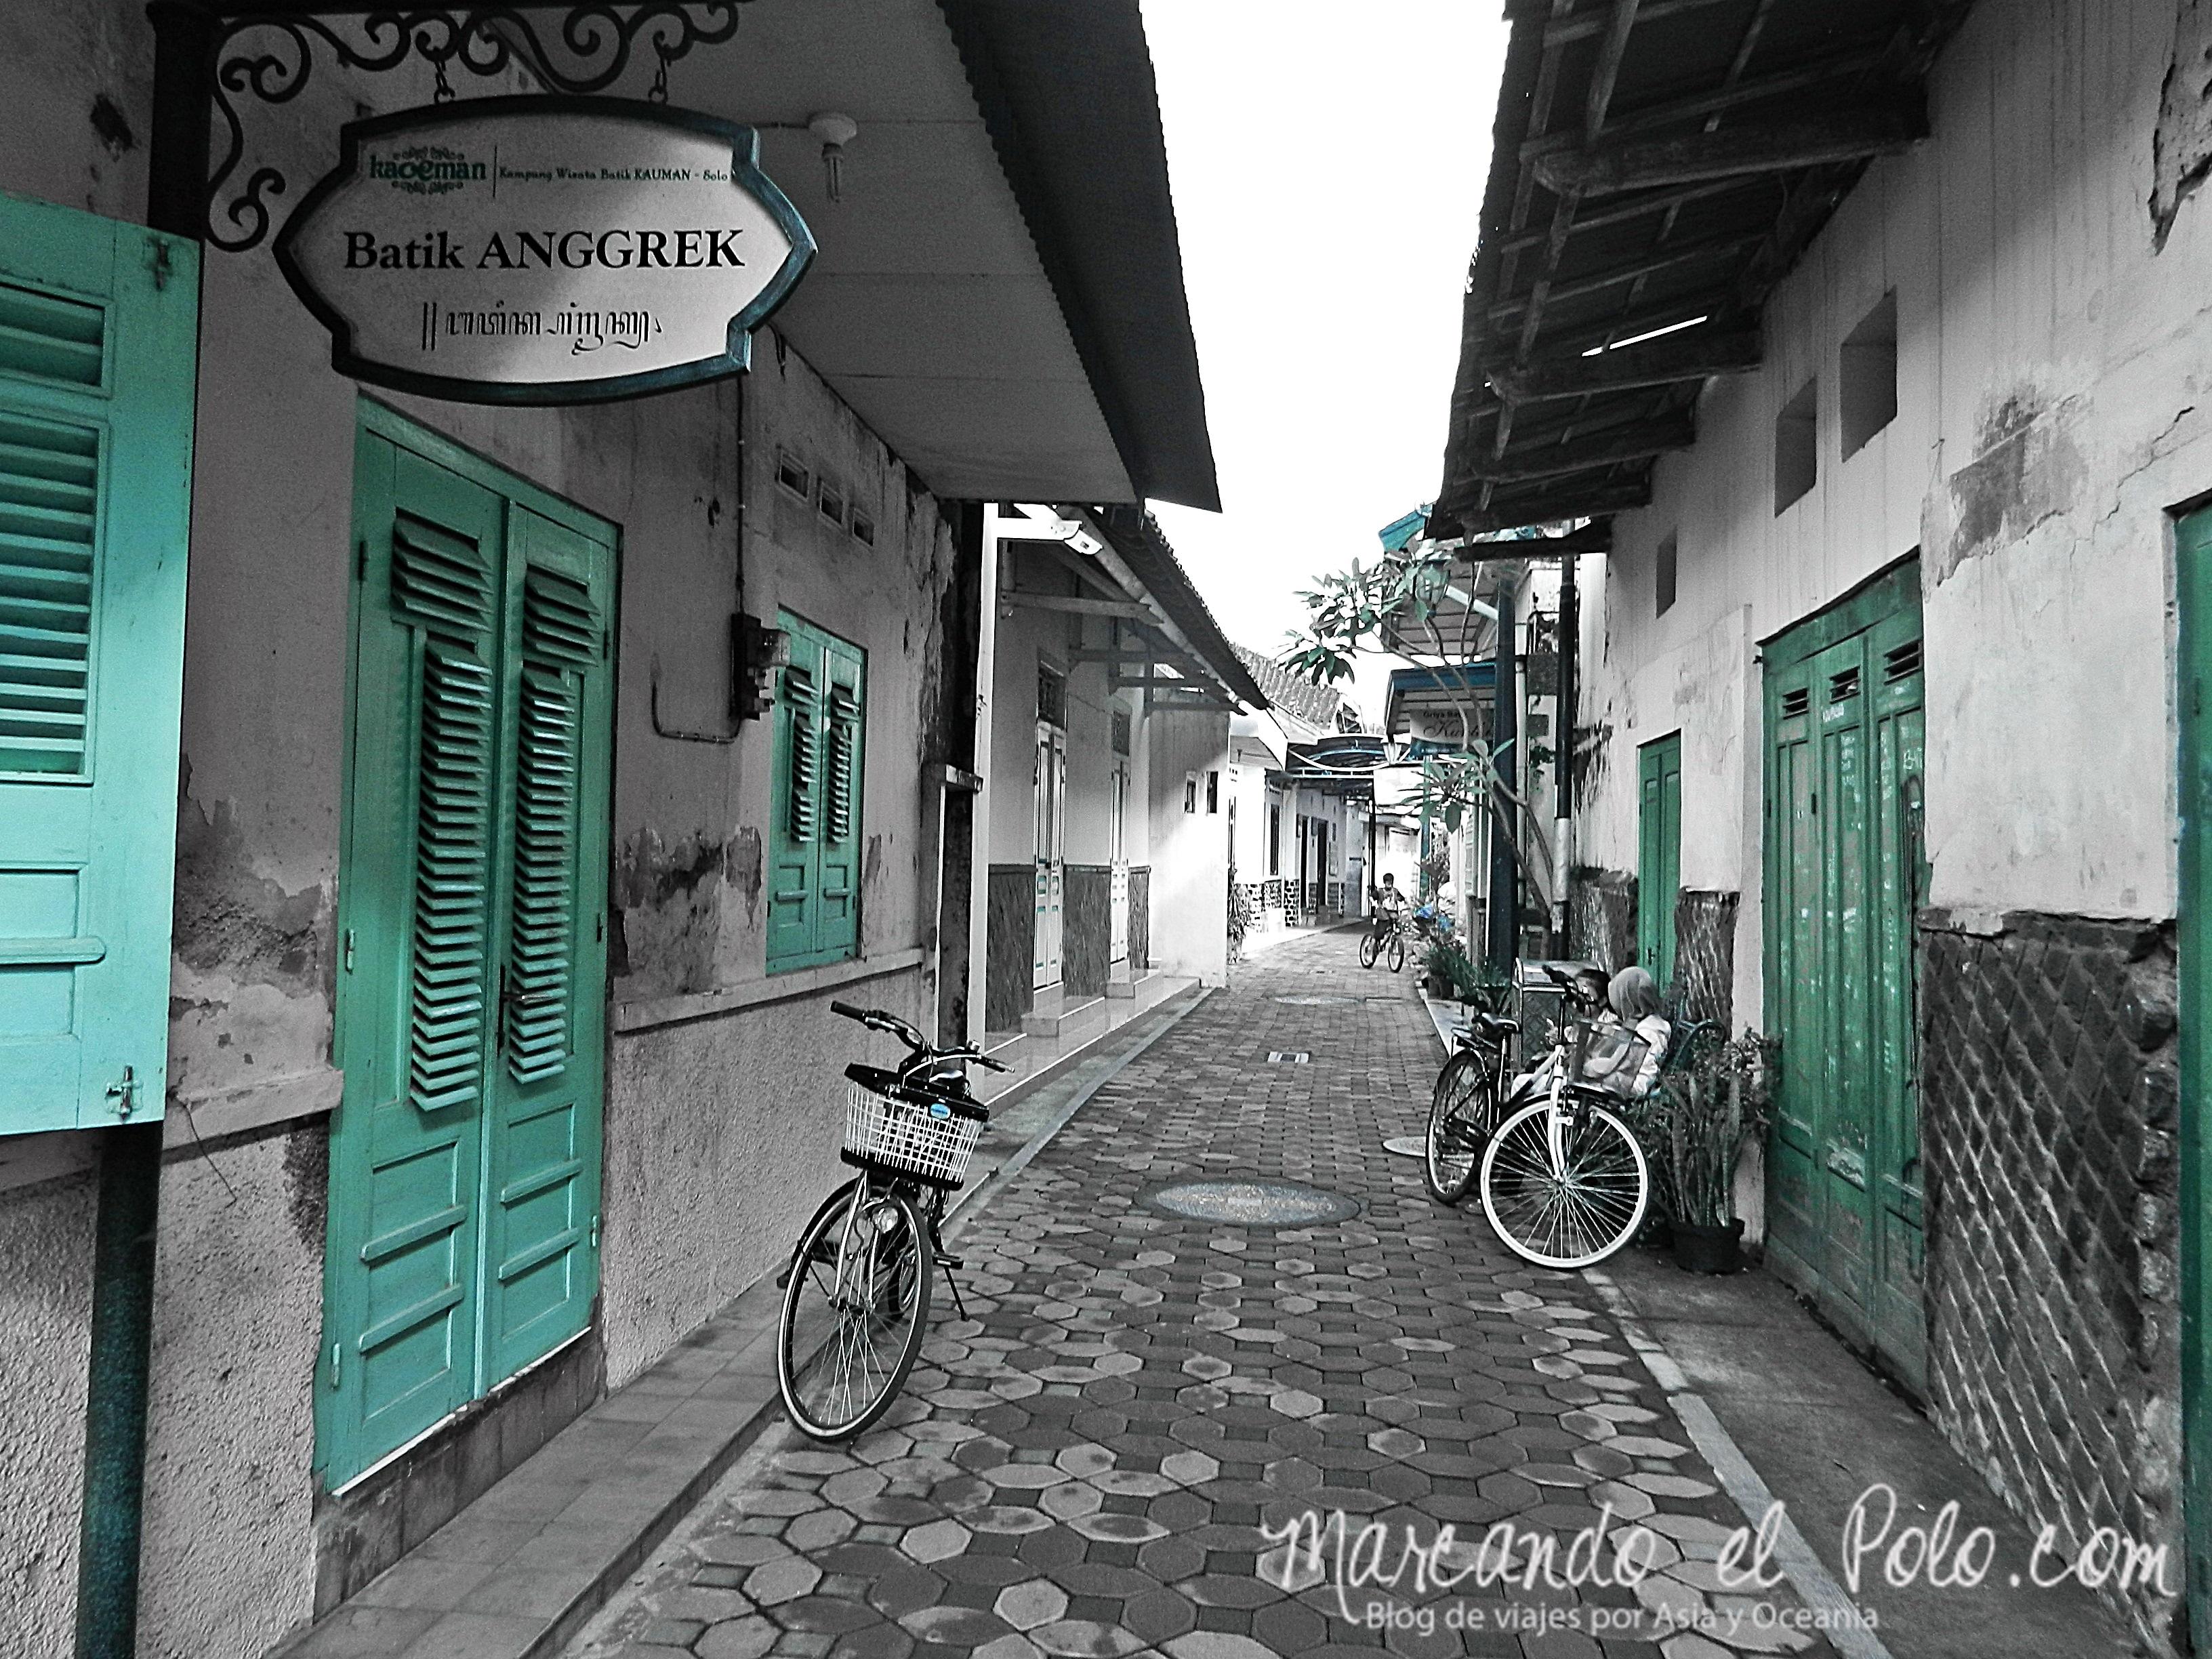 Viajar a Indonesia - Solo